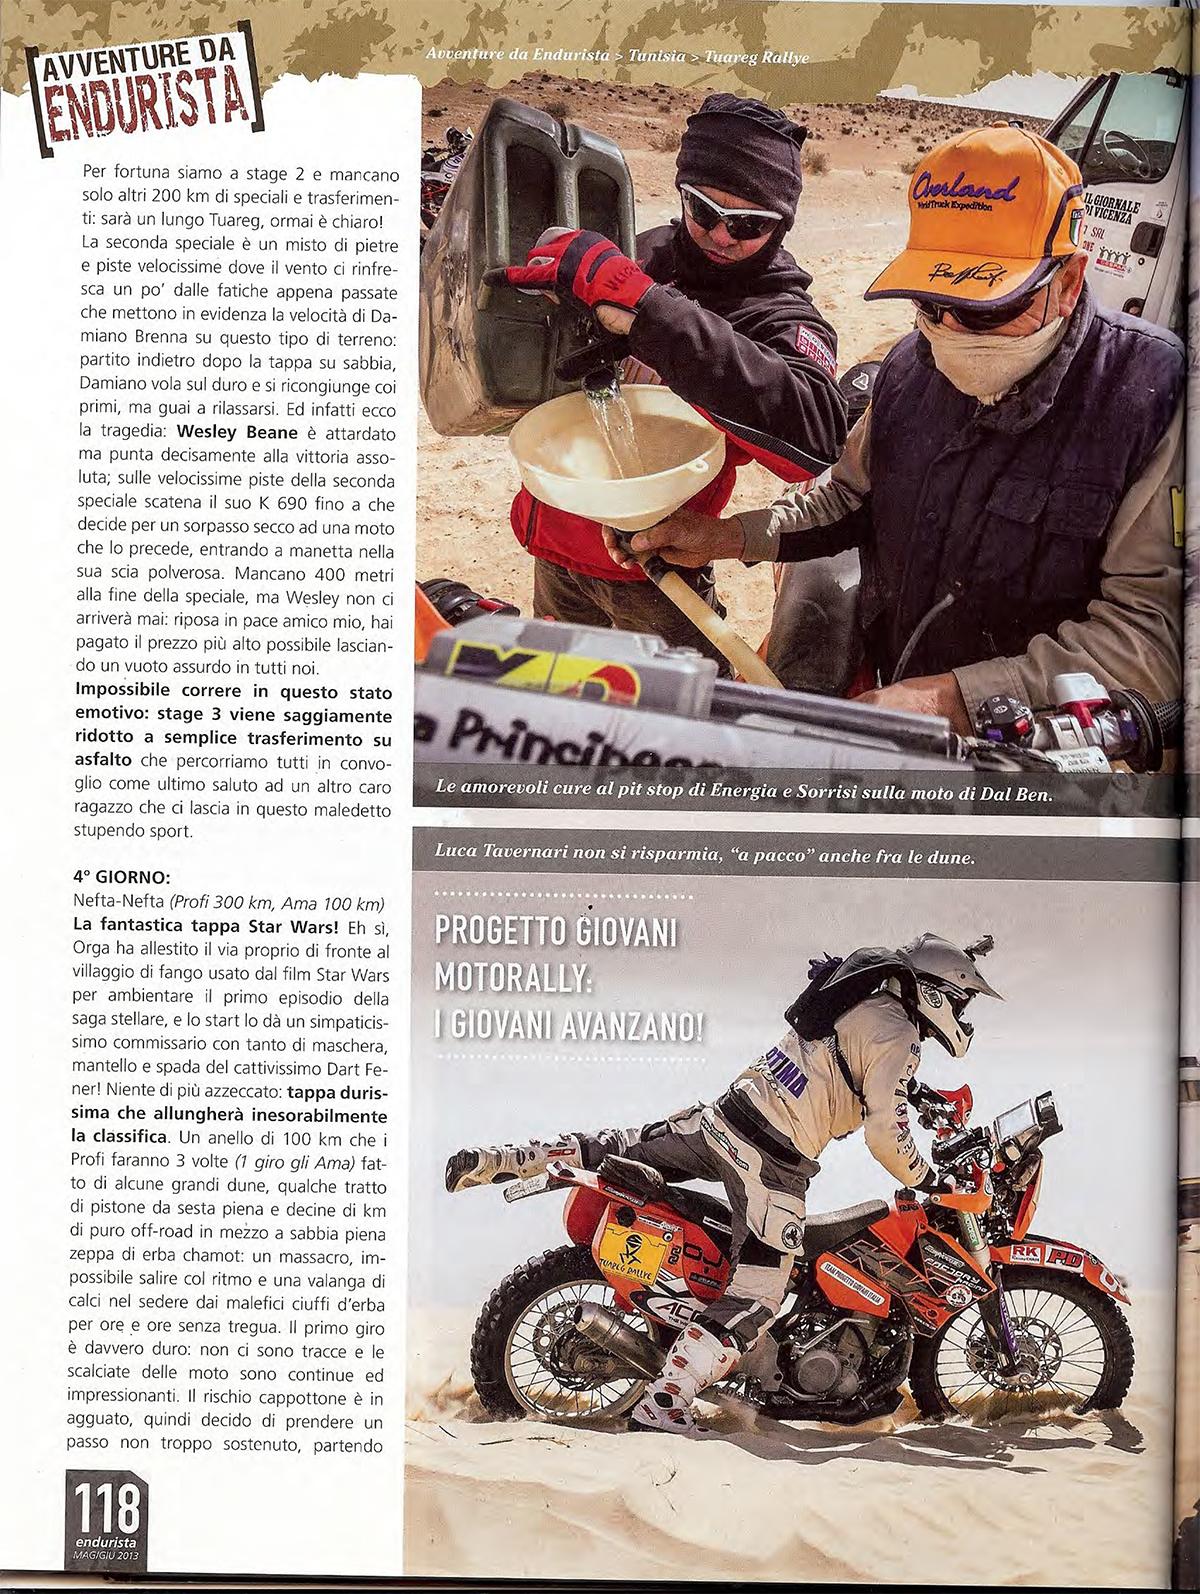 endurista magazine 5